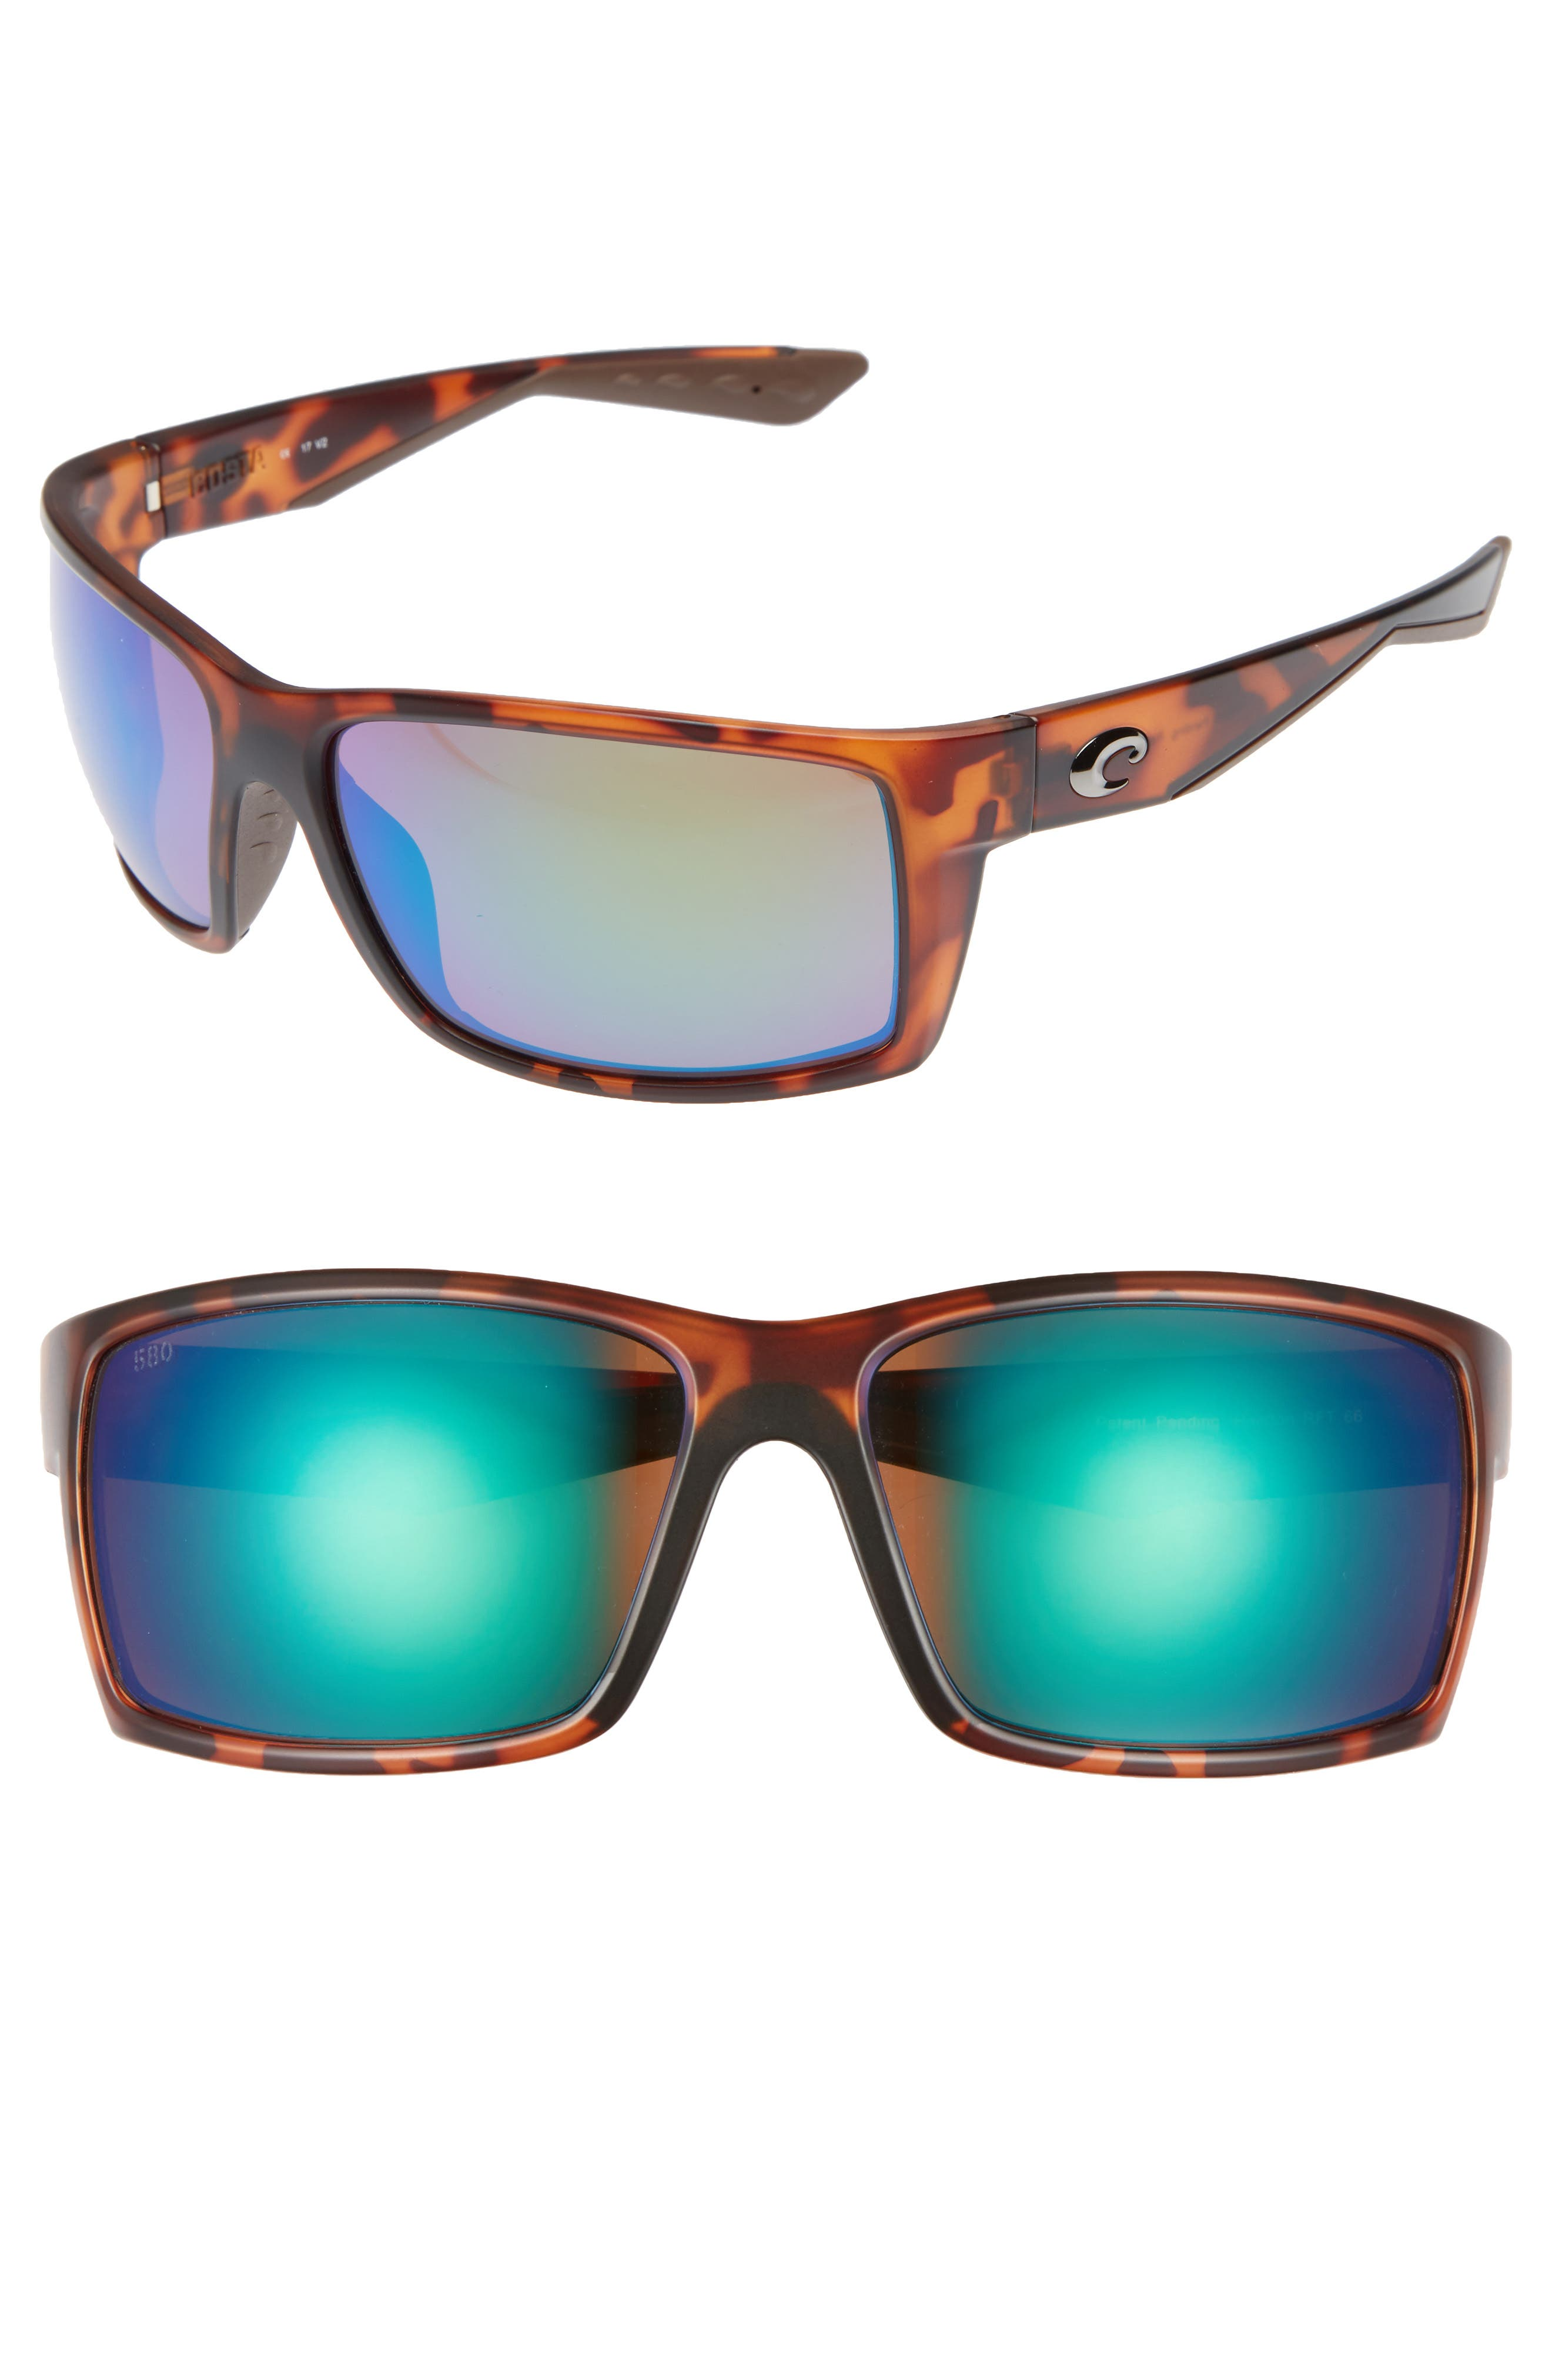 Reefton 65mm Polarized Sunglasses,                             Main thumbnail 1, color,                             Tortoise/ Green Mirror